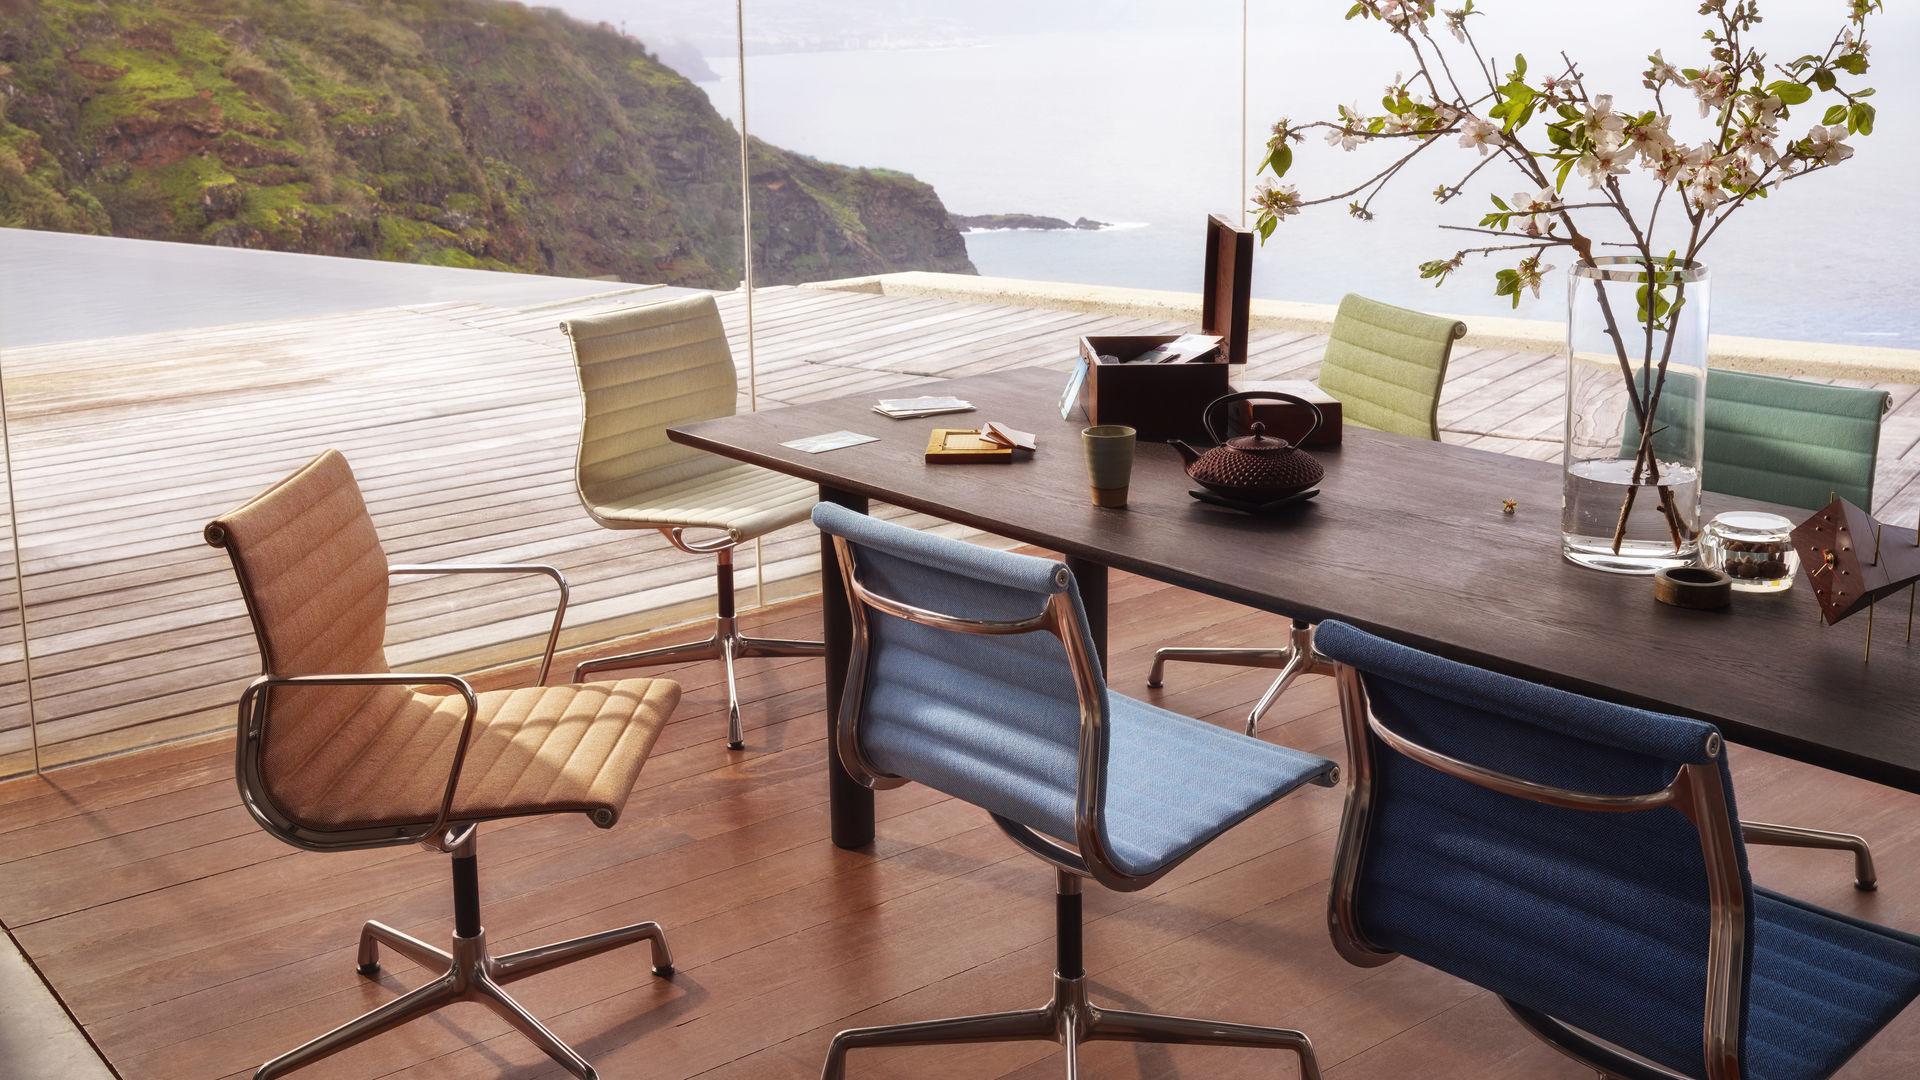 Aluminium Chair EA 101 -104_hopsak_79_83_84_85_87_88_Wood Table_web_inspiration